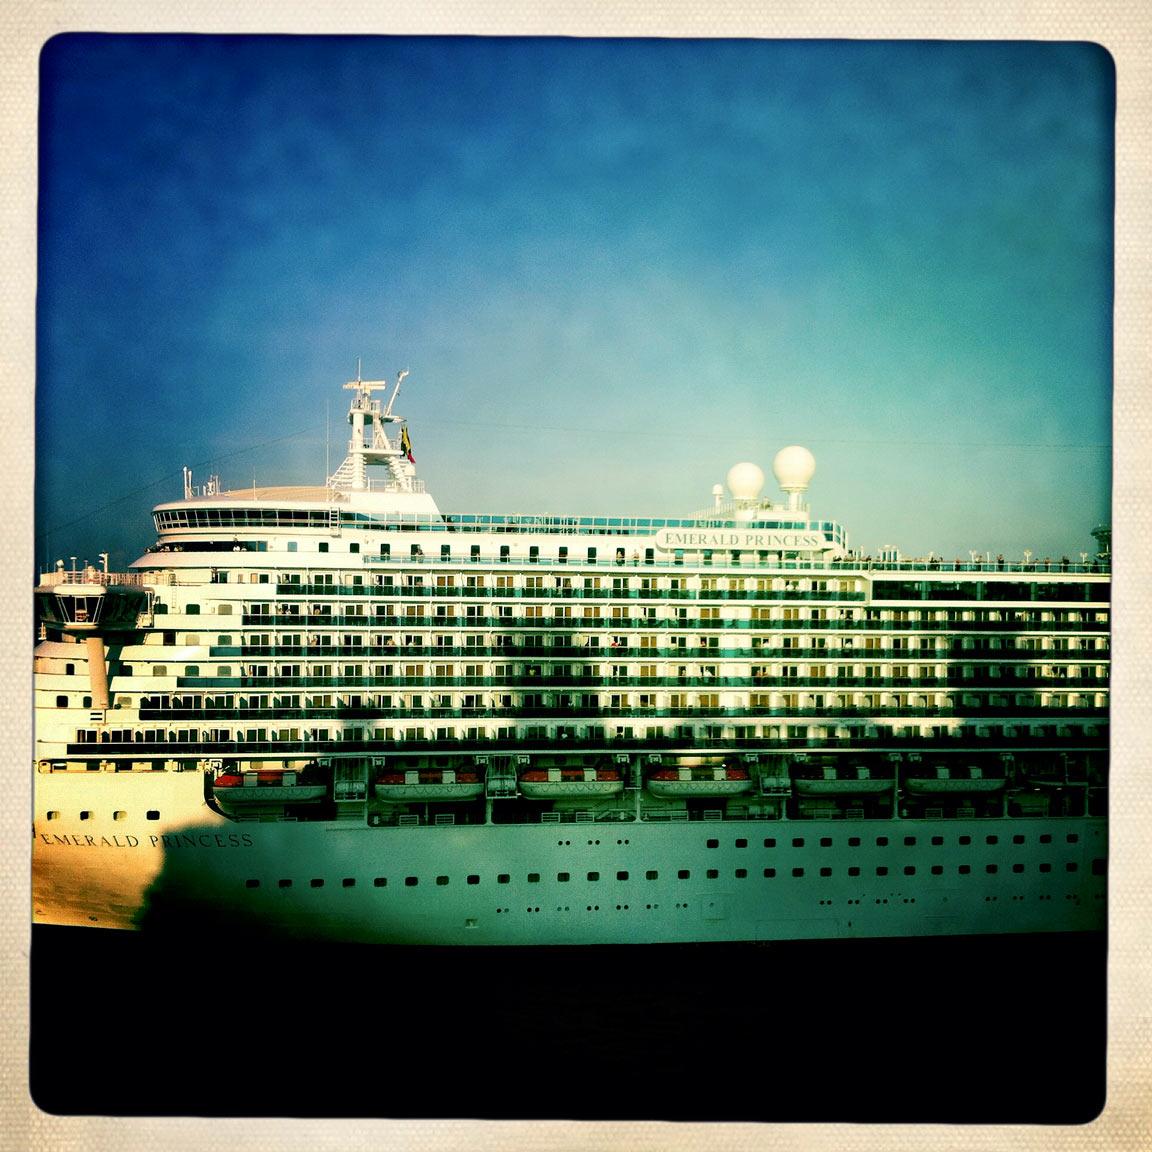 Cruise5_2017-11-7